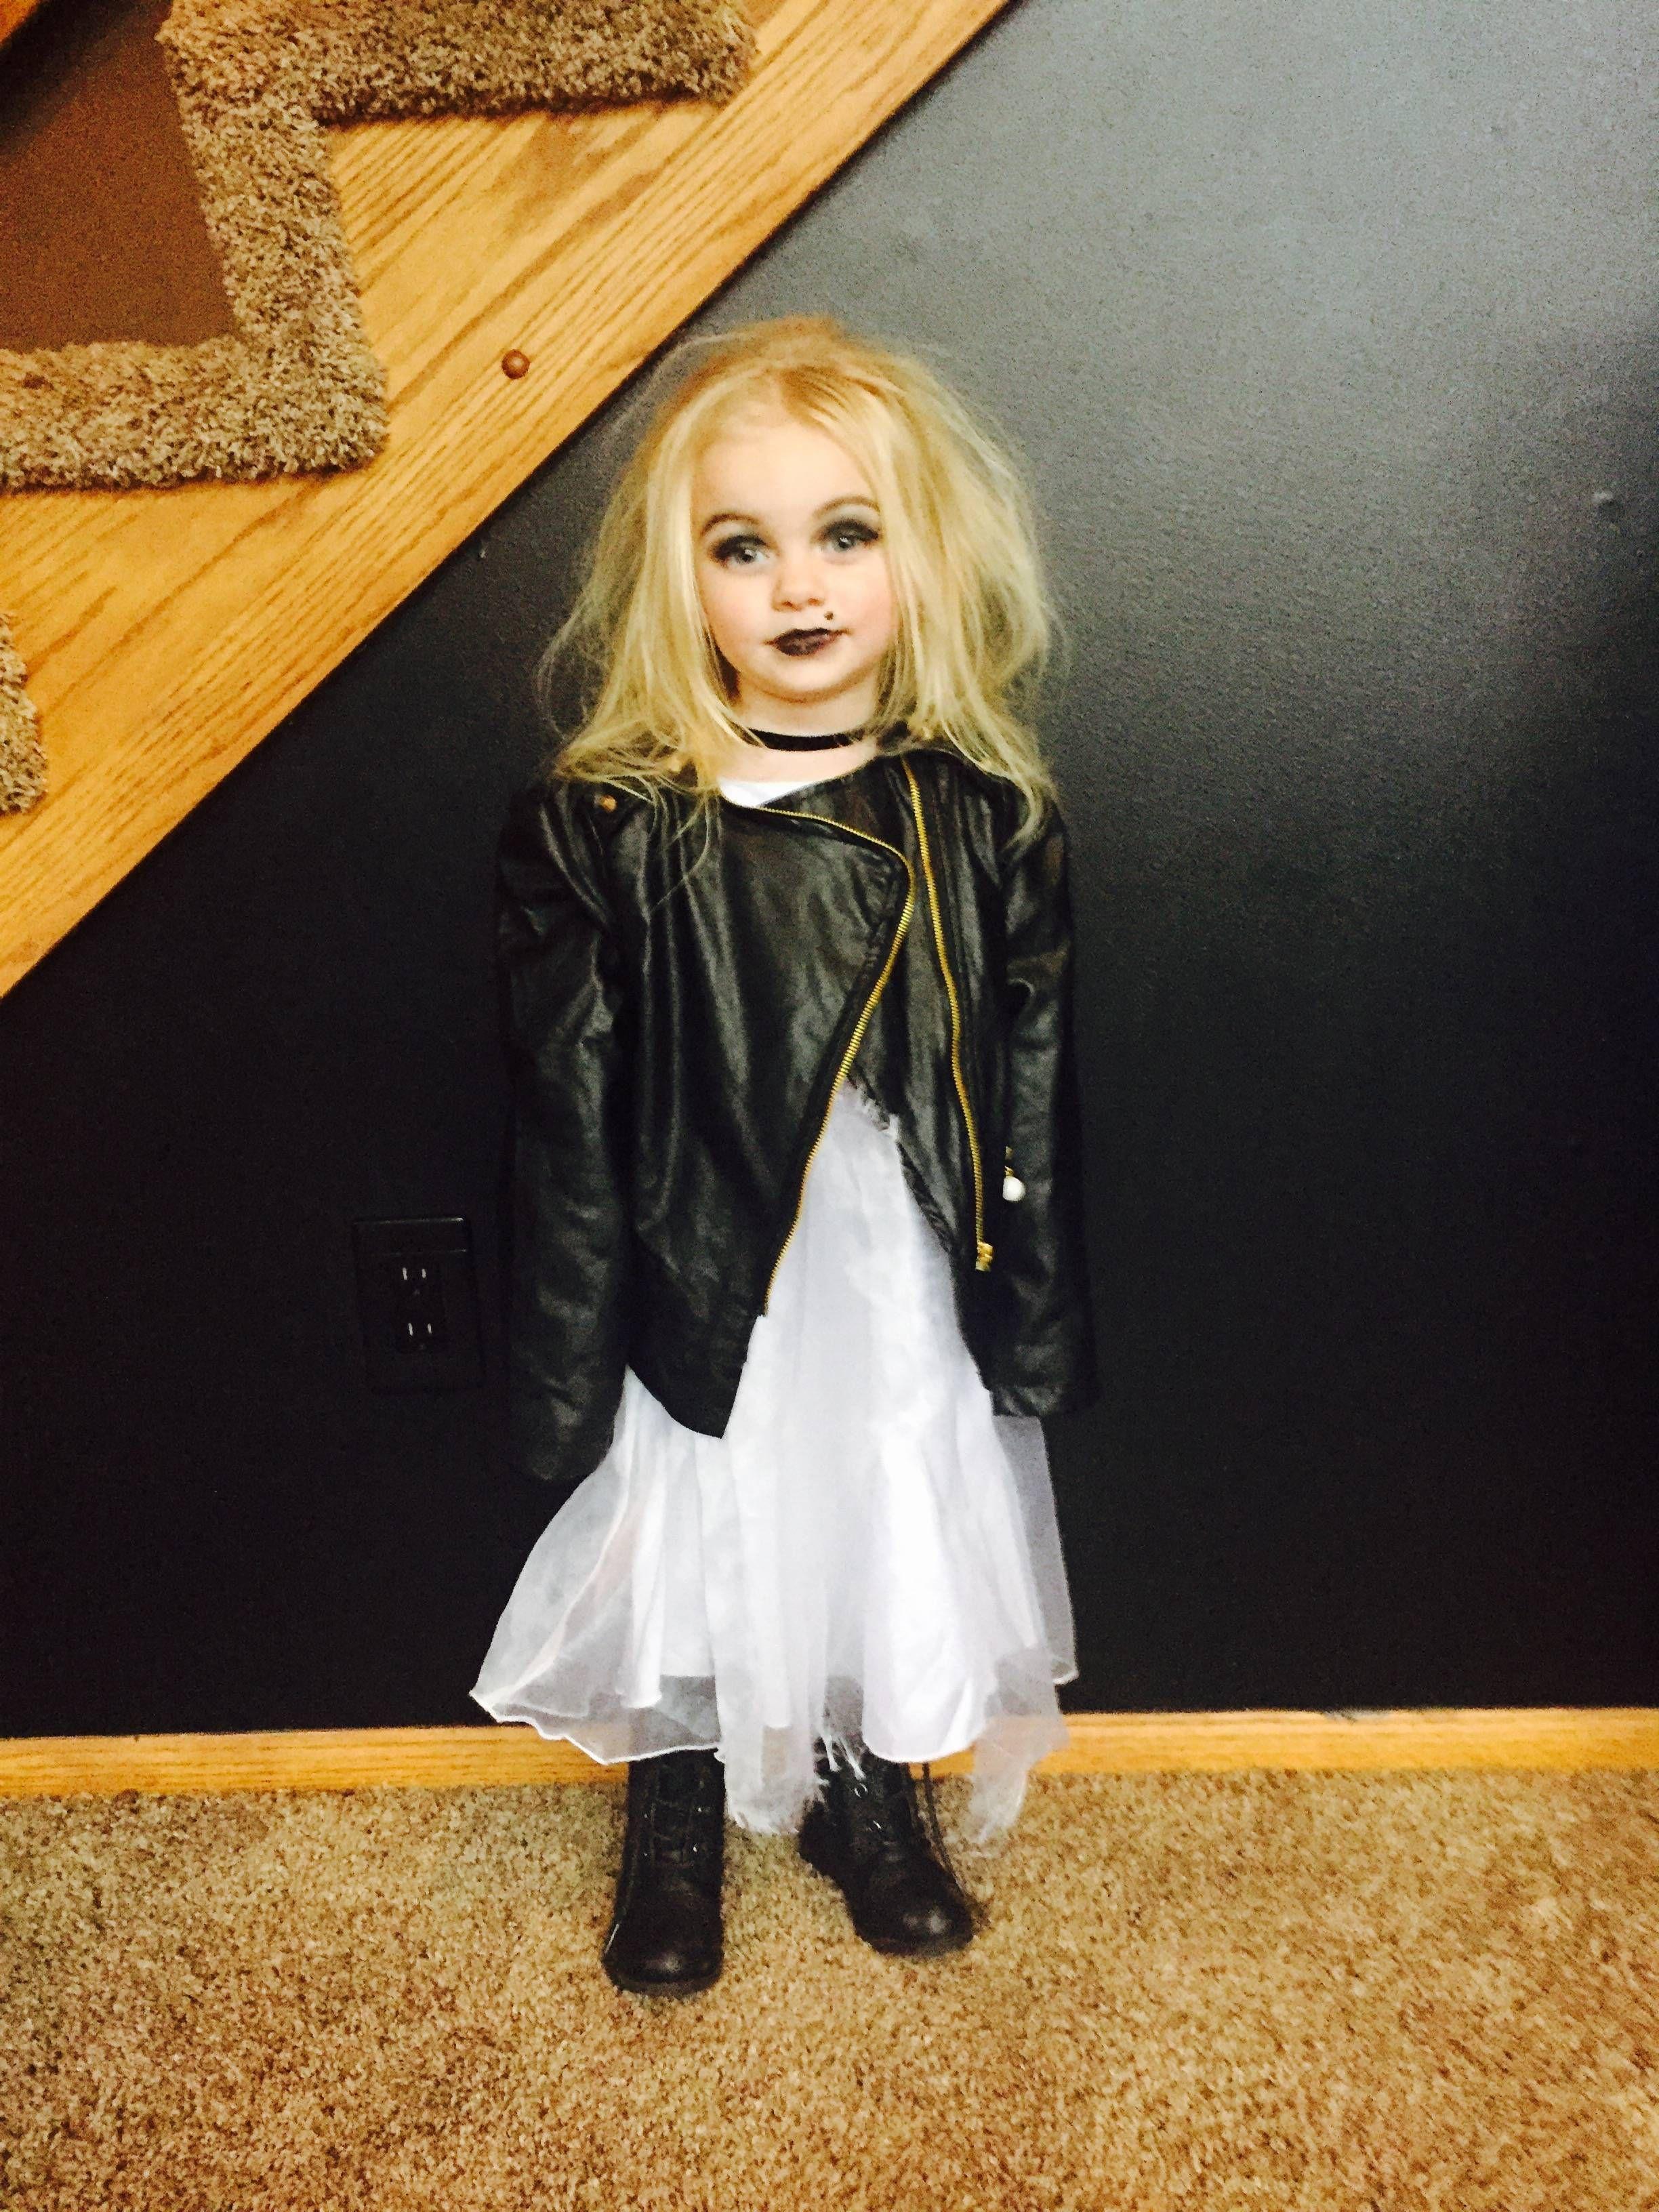 bride of chucky halloween costume | halloween | pinterest